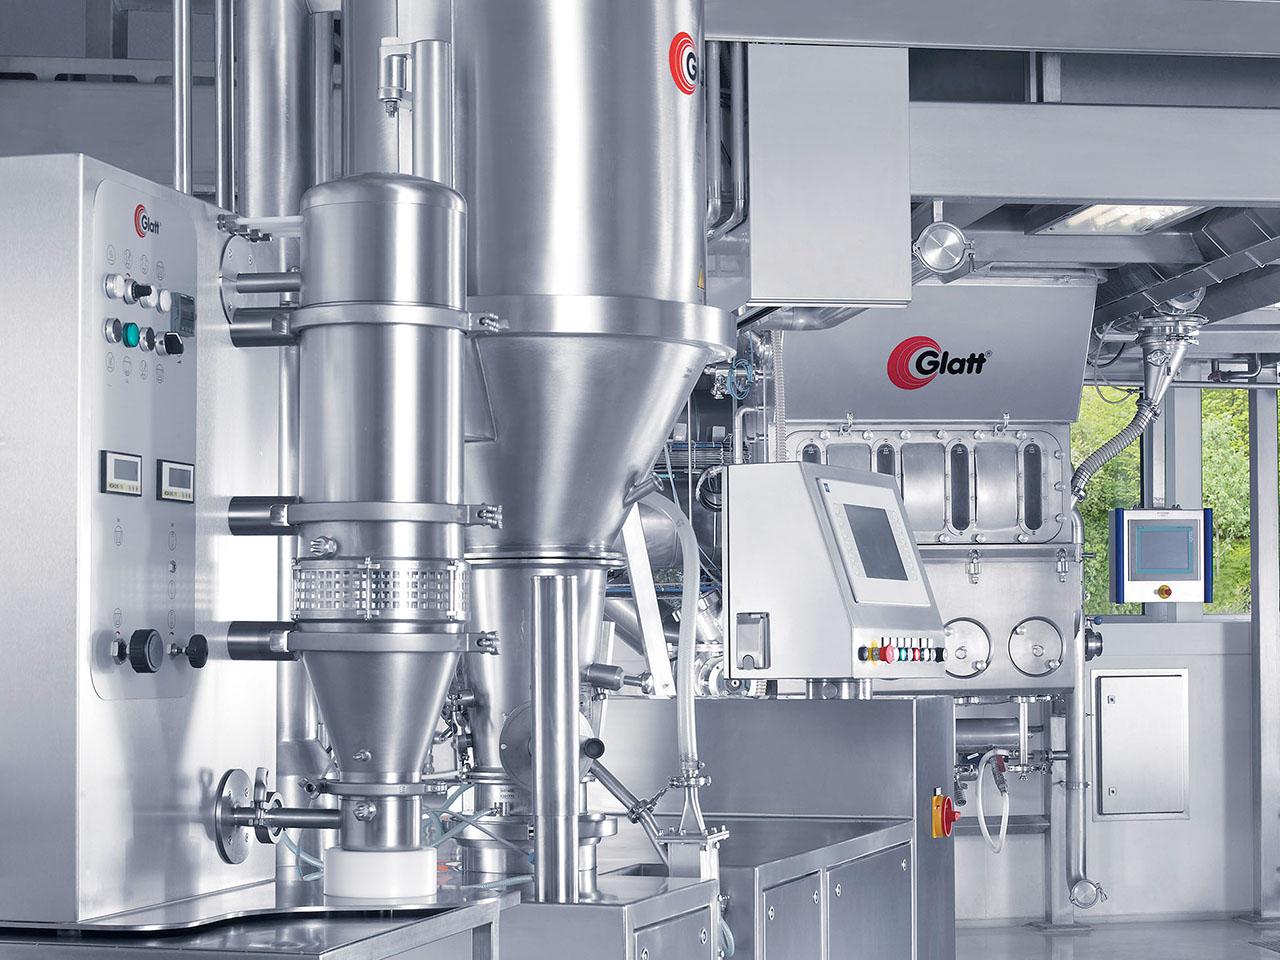 Fluid Bed Lab-Pilot-Production Equipment in the Glatt Technology Center Weimar